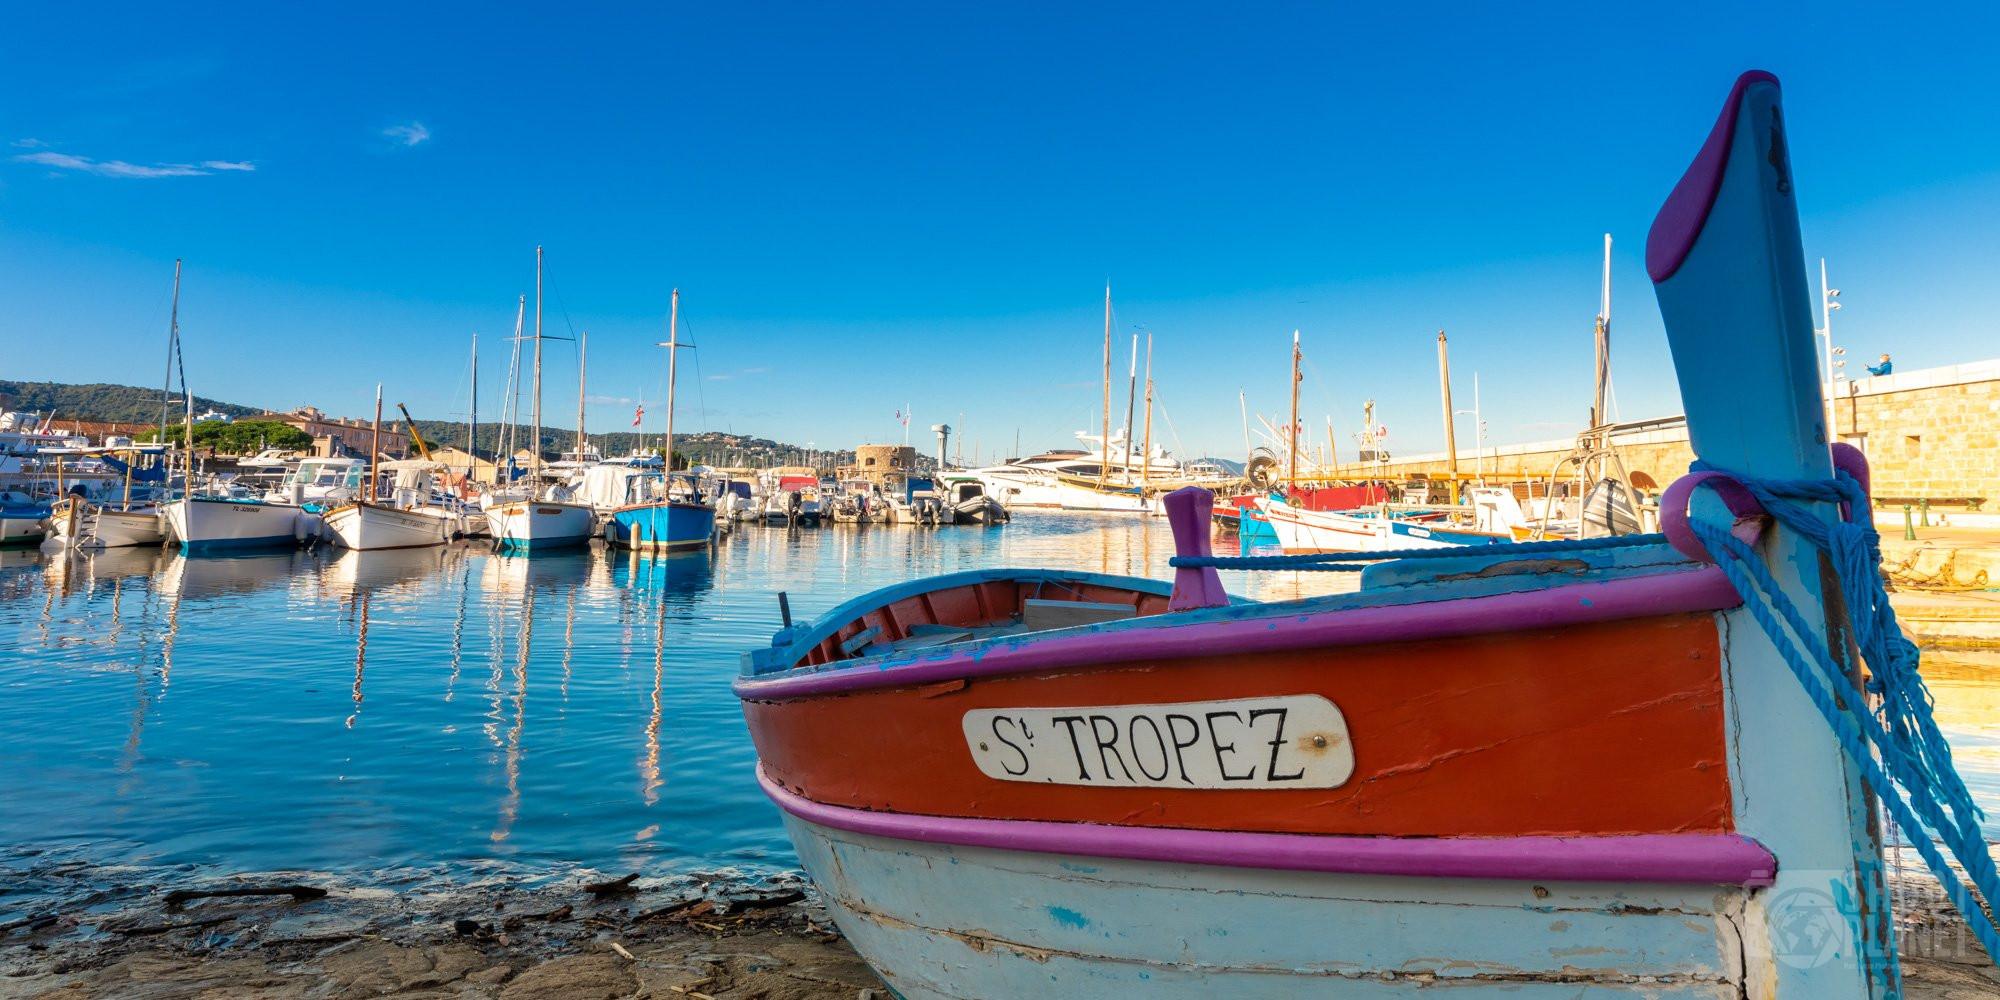 Fishing boat in Saint-Tropez harbor, France